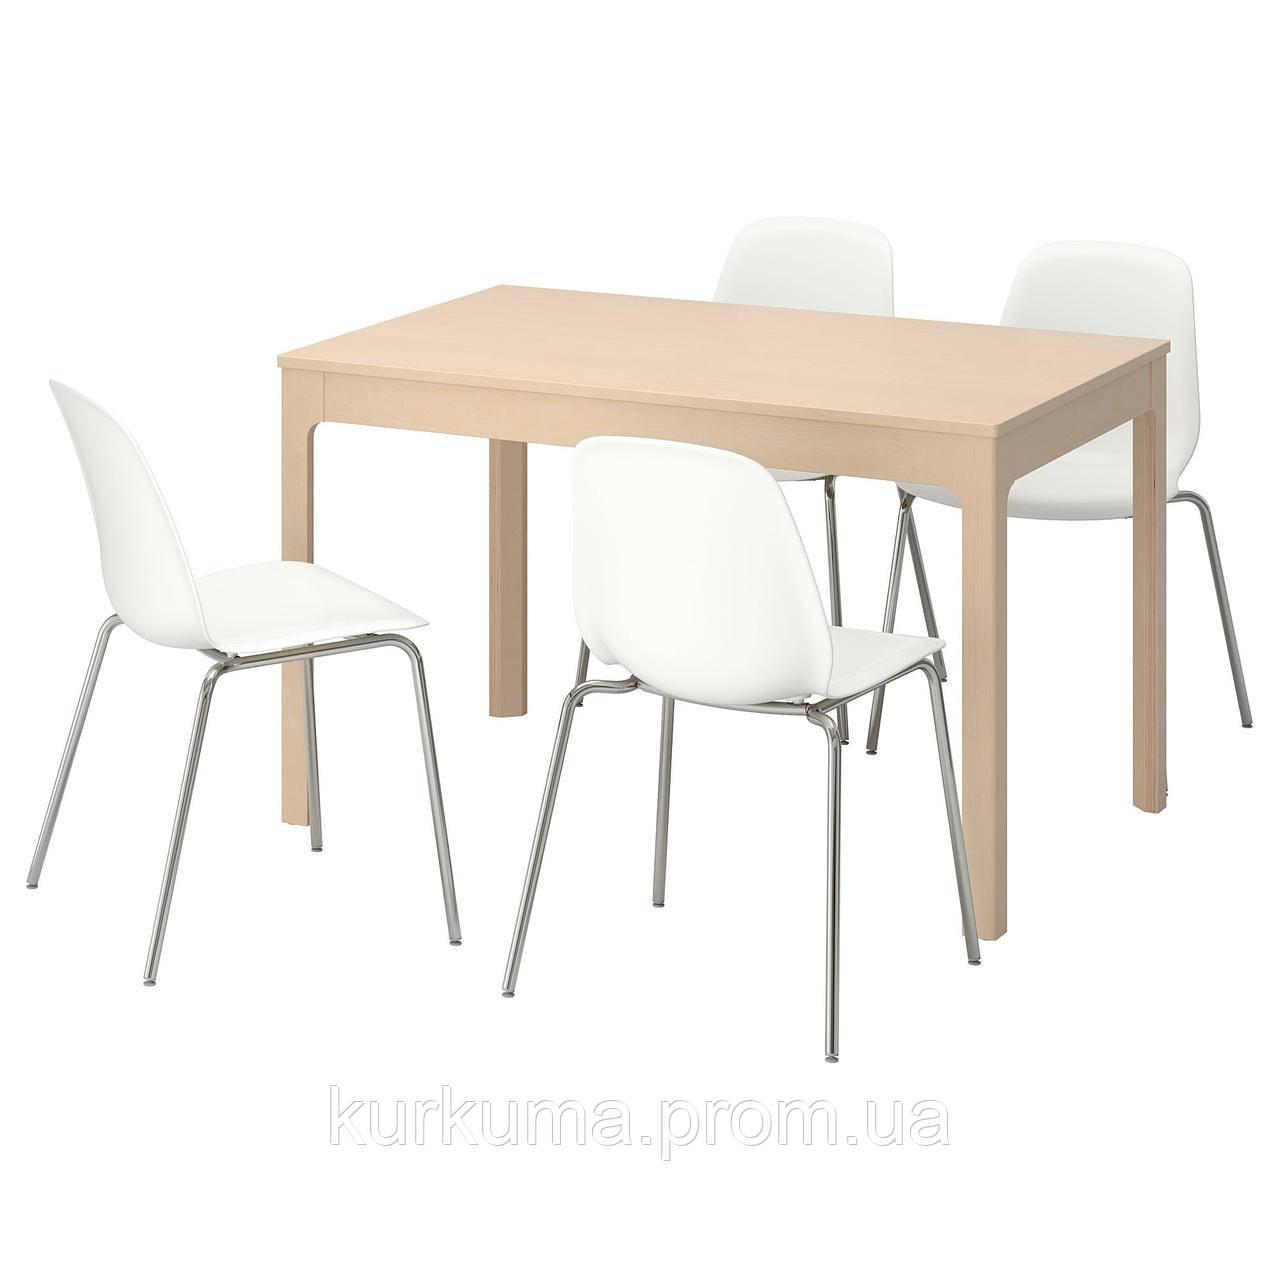 IKEA EKEDALEN/LEIFARNE Стол и 4 стула, береза, белый  (492.214.63)